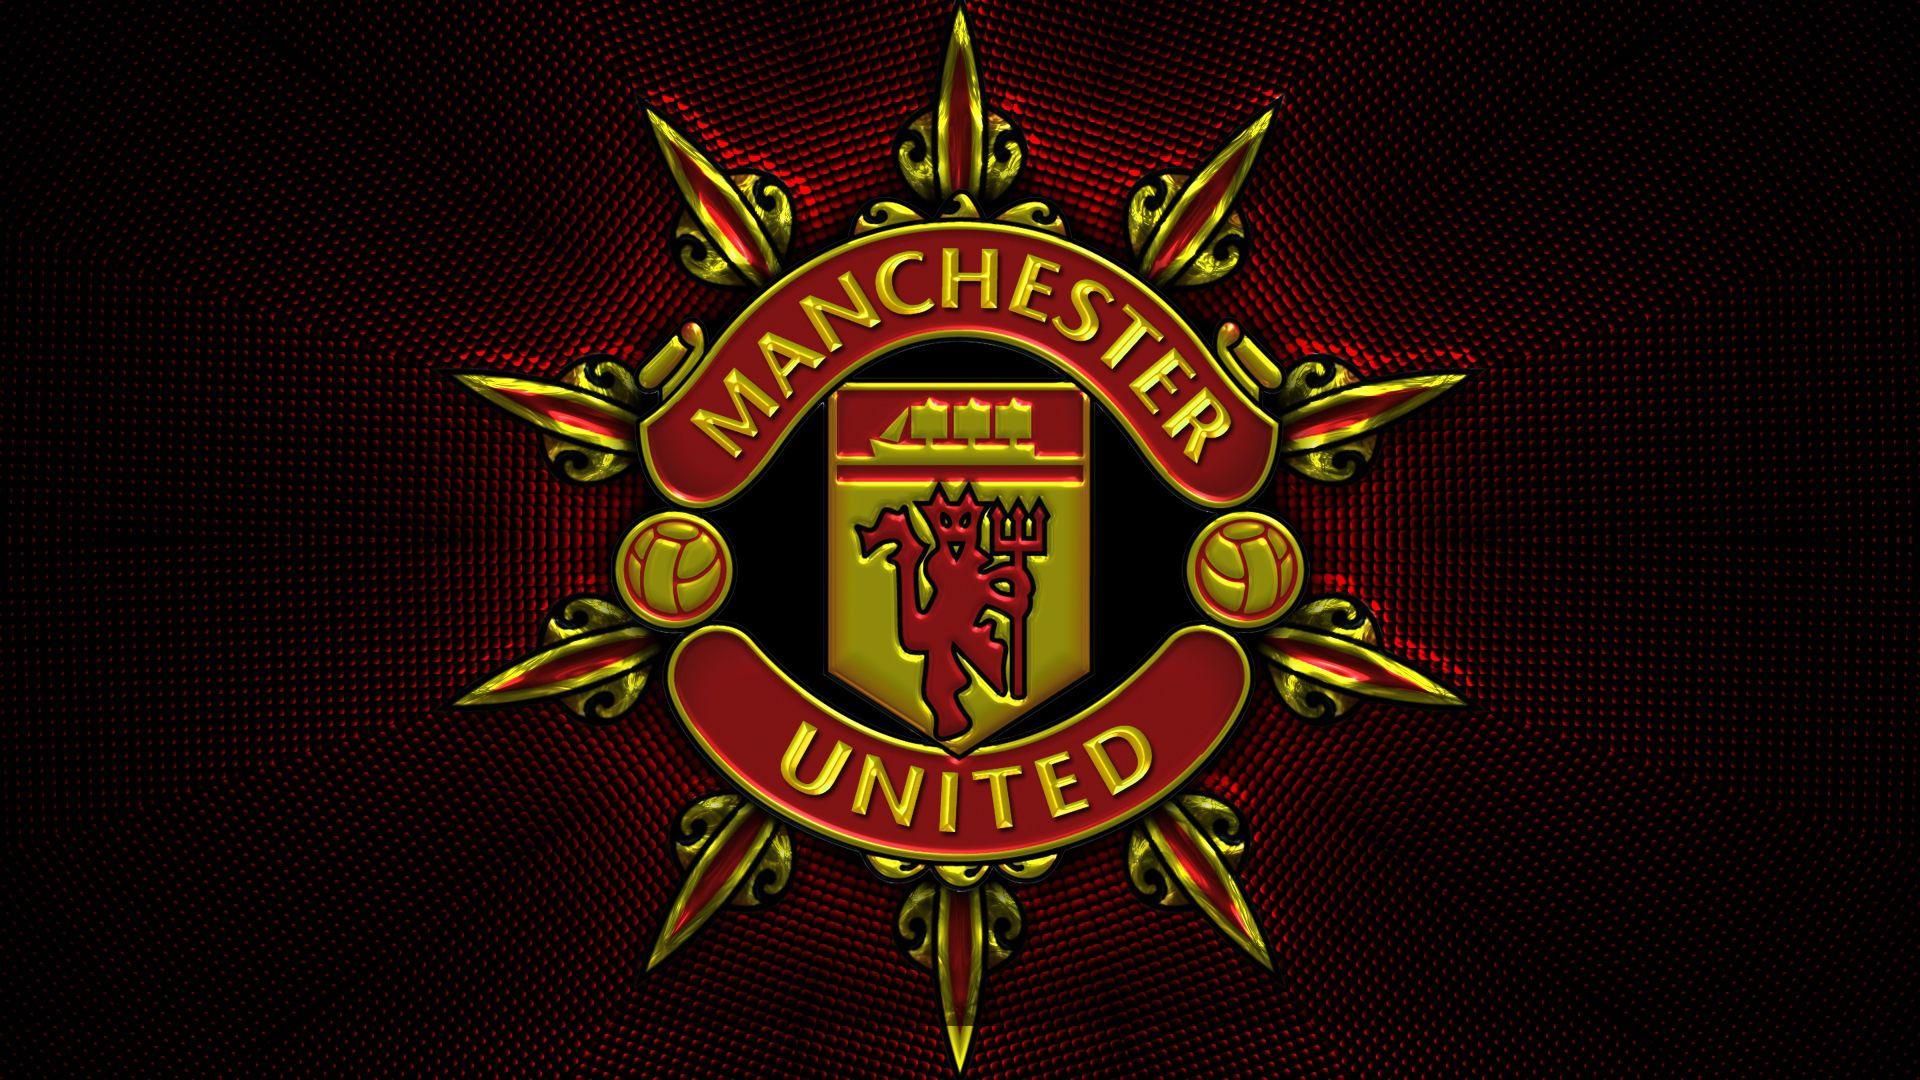 Epingle Par Nanang Enzo Sur Manchester United Logo Angleterre Manchester United Fond D Ecran Foot Manchester